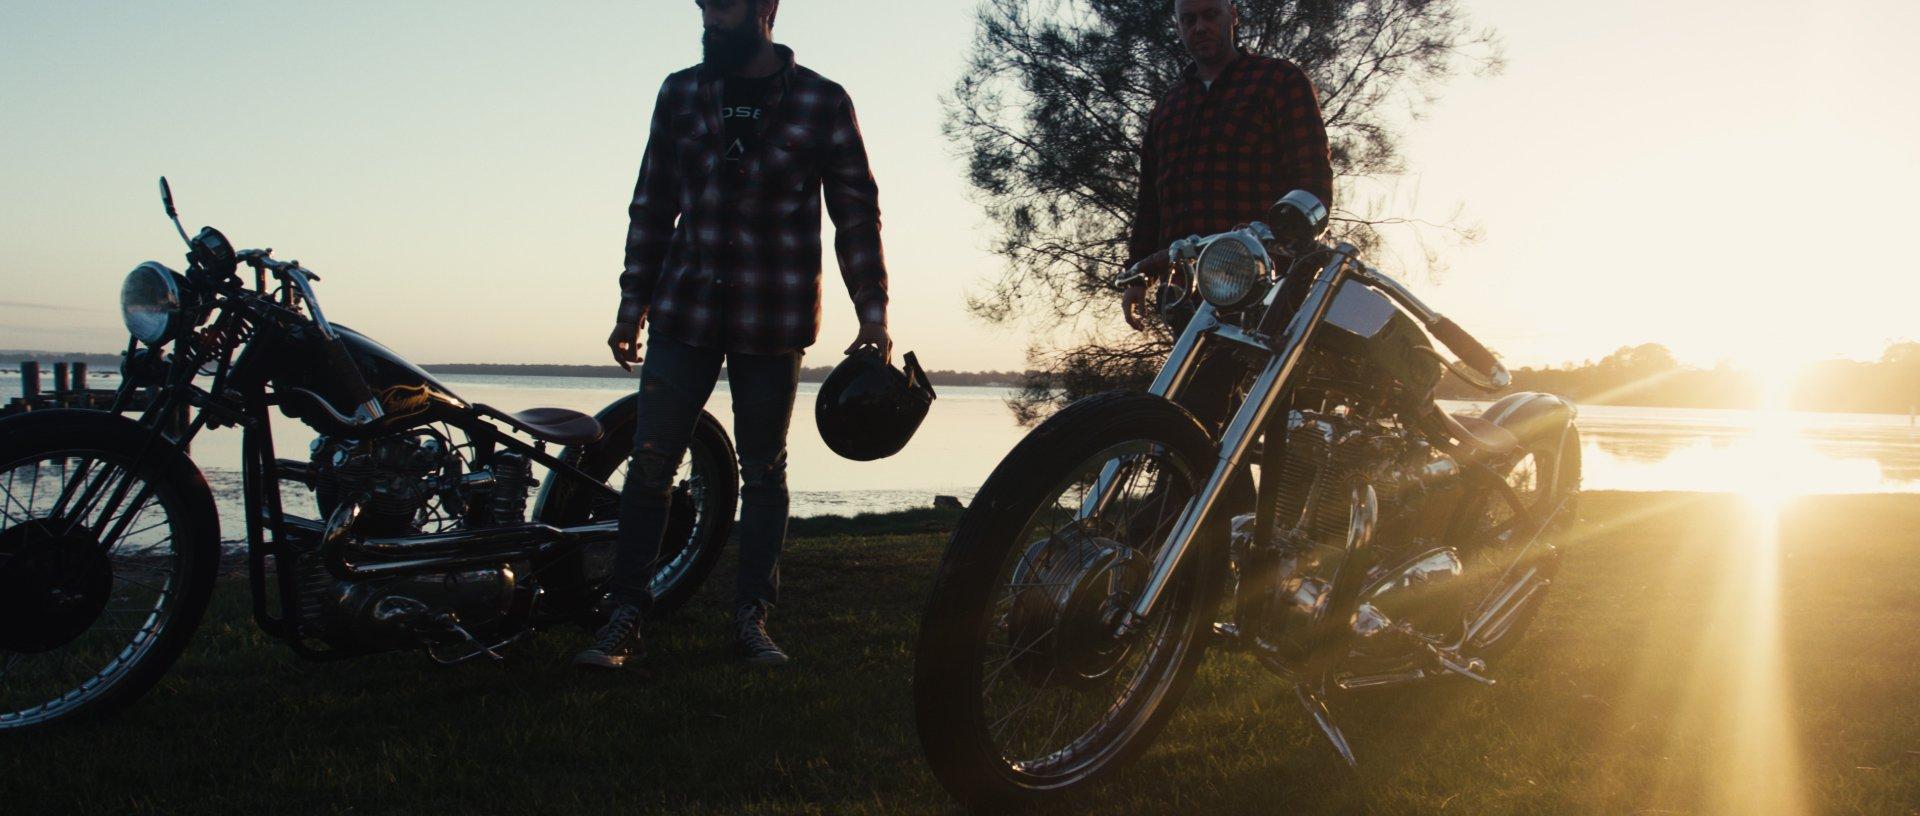 custom motorcycle film documentary custom bike cafe racer